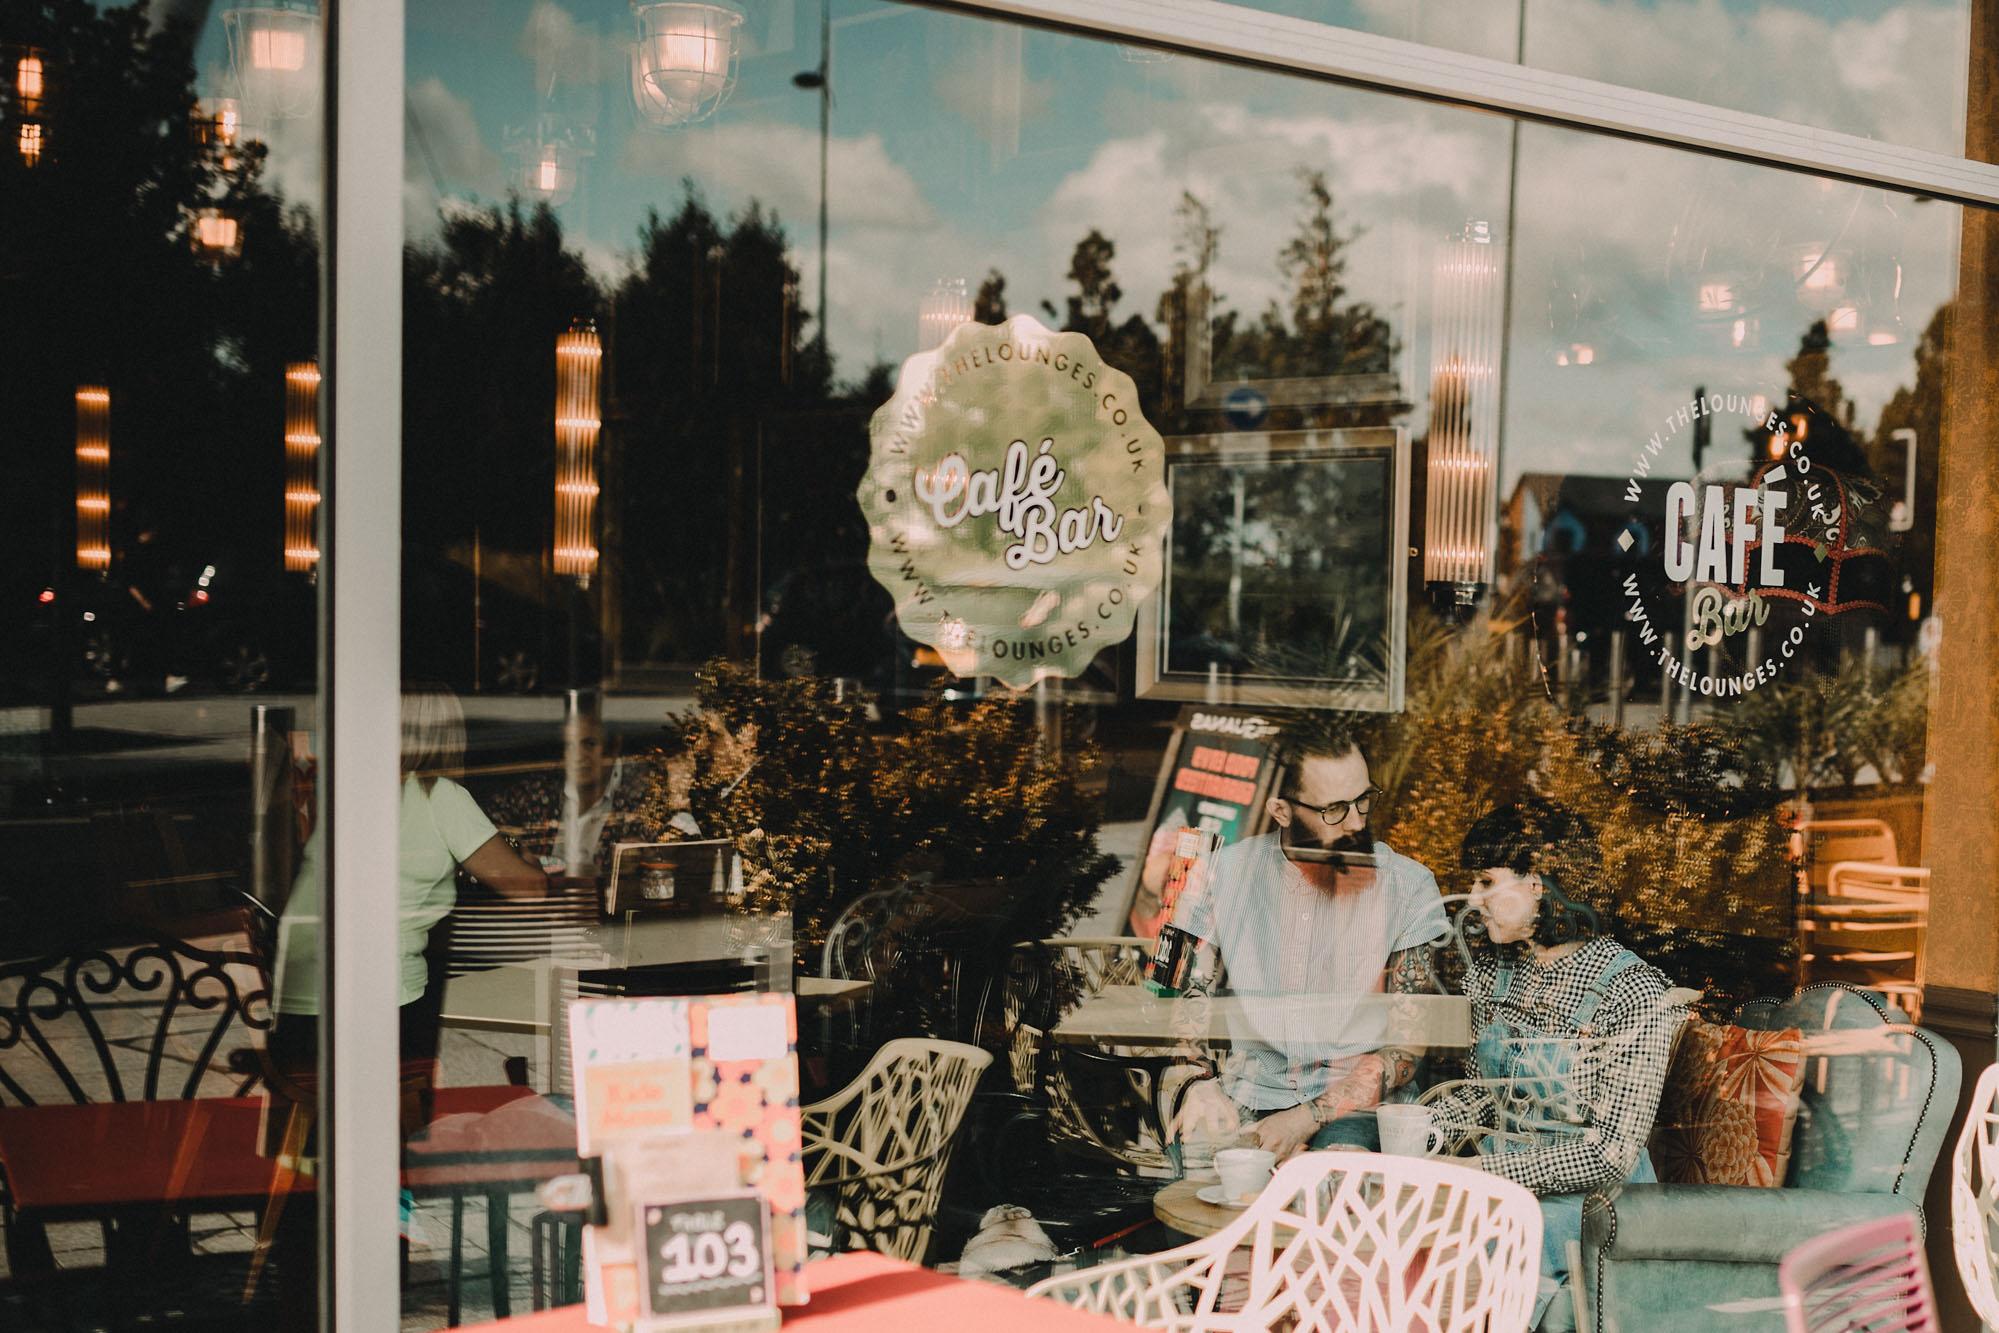 Cafe-Bar-Engagement-Photography27.jpg